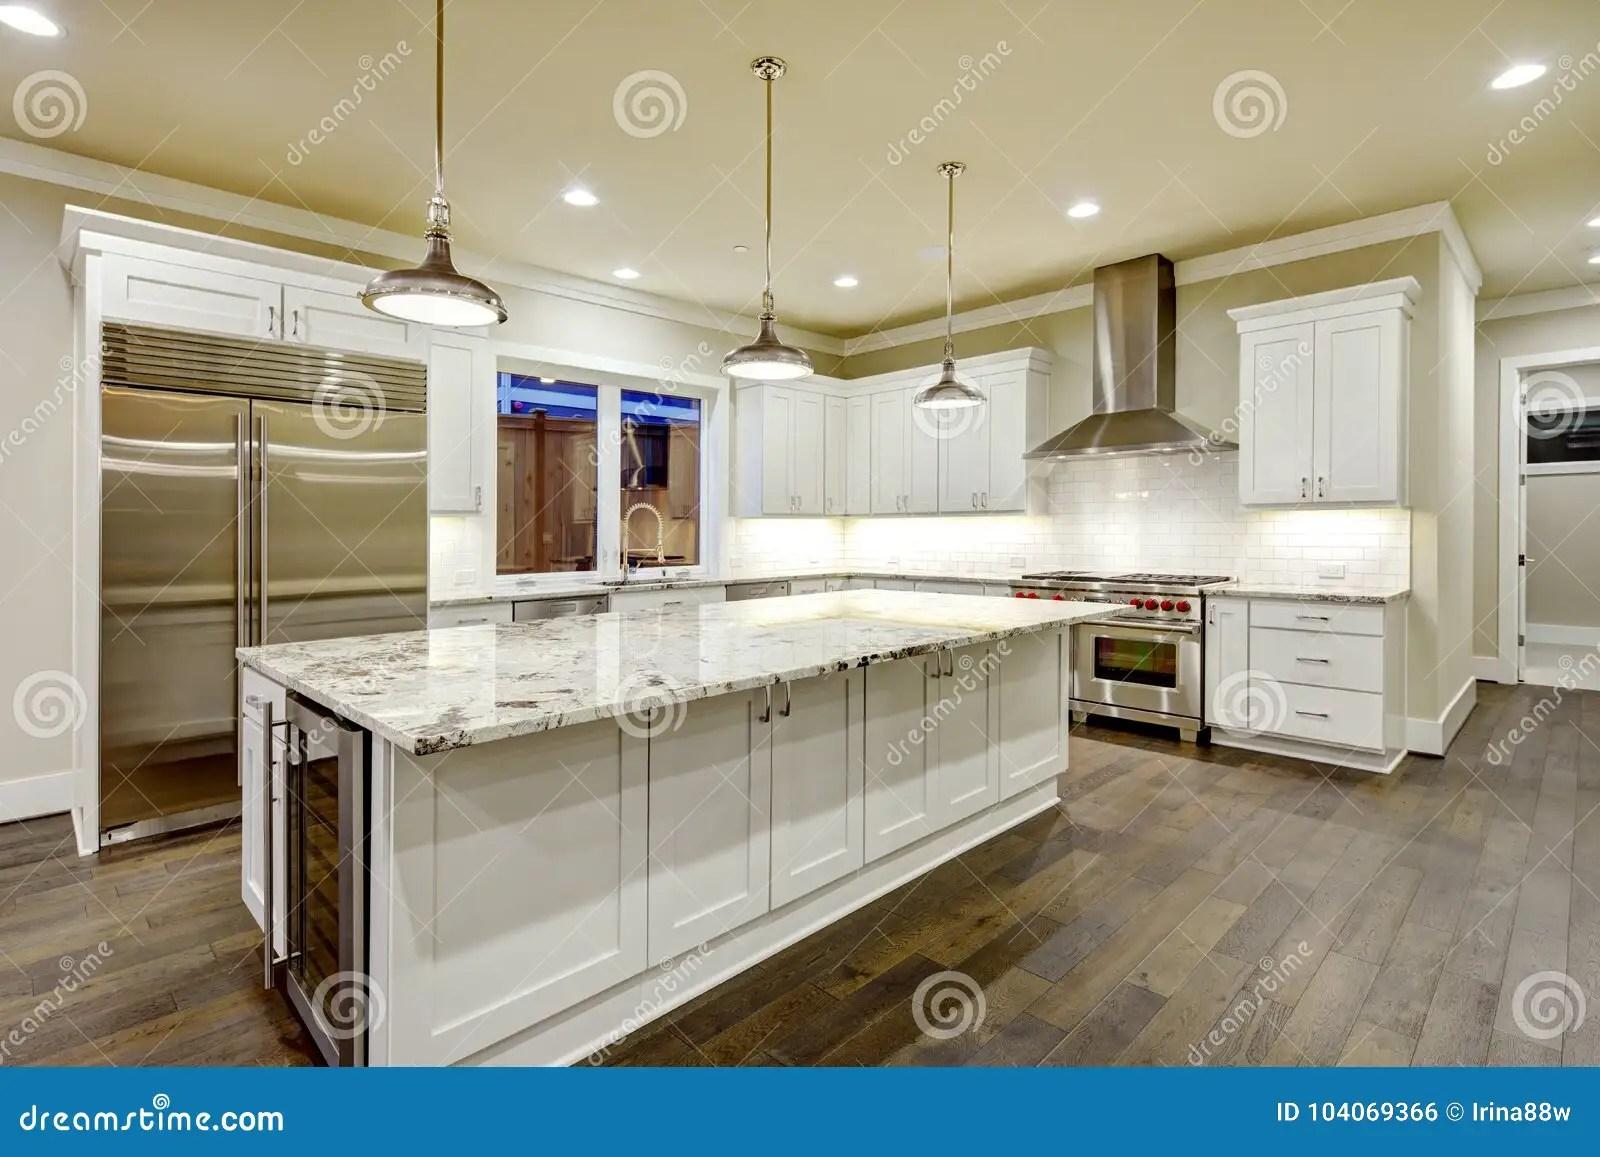 renew kitchen cabinets moen touch control faucet 与白色厨柜的大 宽敞厨房设计库存照片 图片包括有西北 照亮 家具 宽敞厨房设计